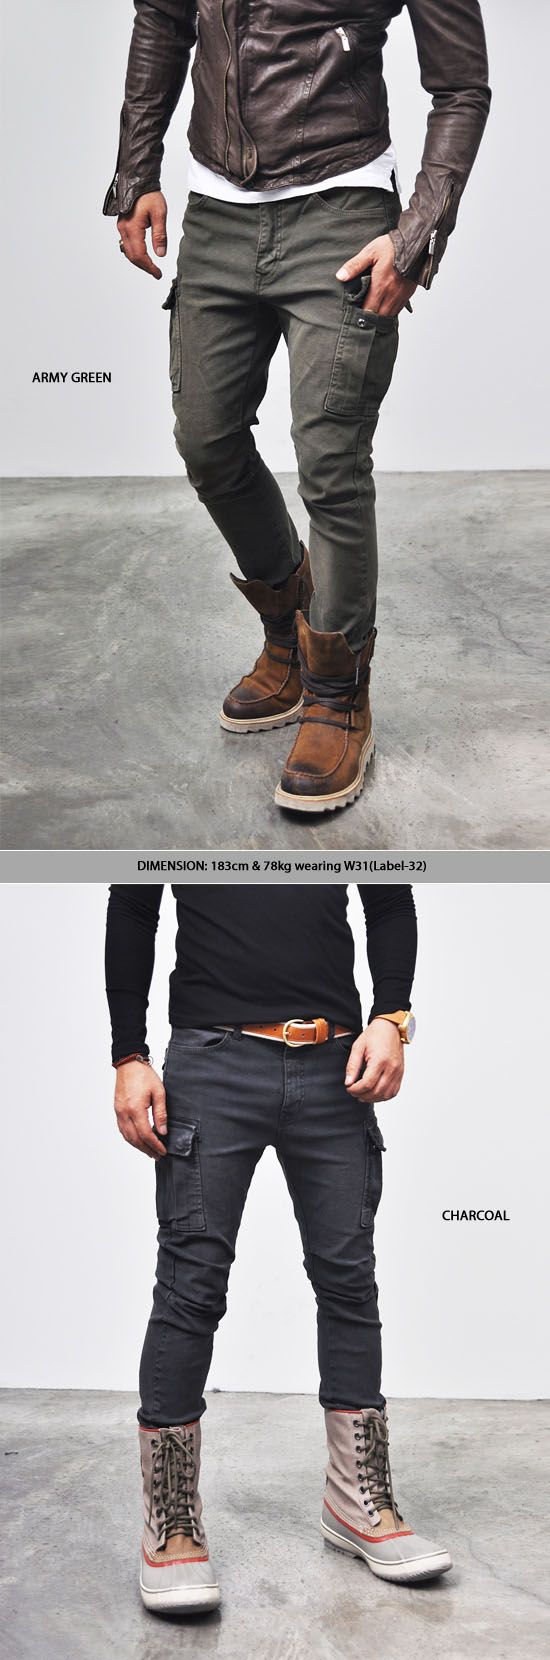 Fashionable Pants For Men